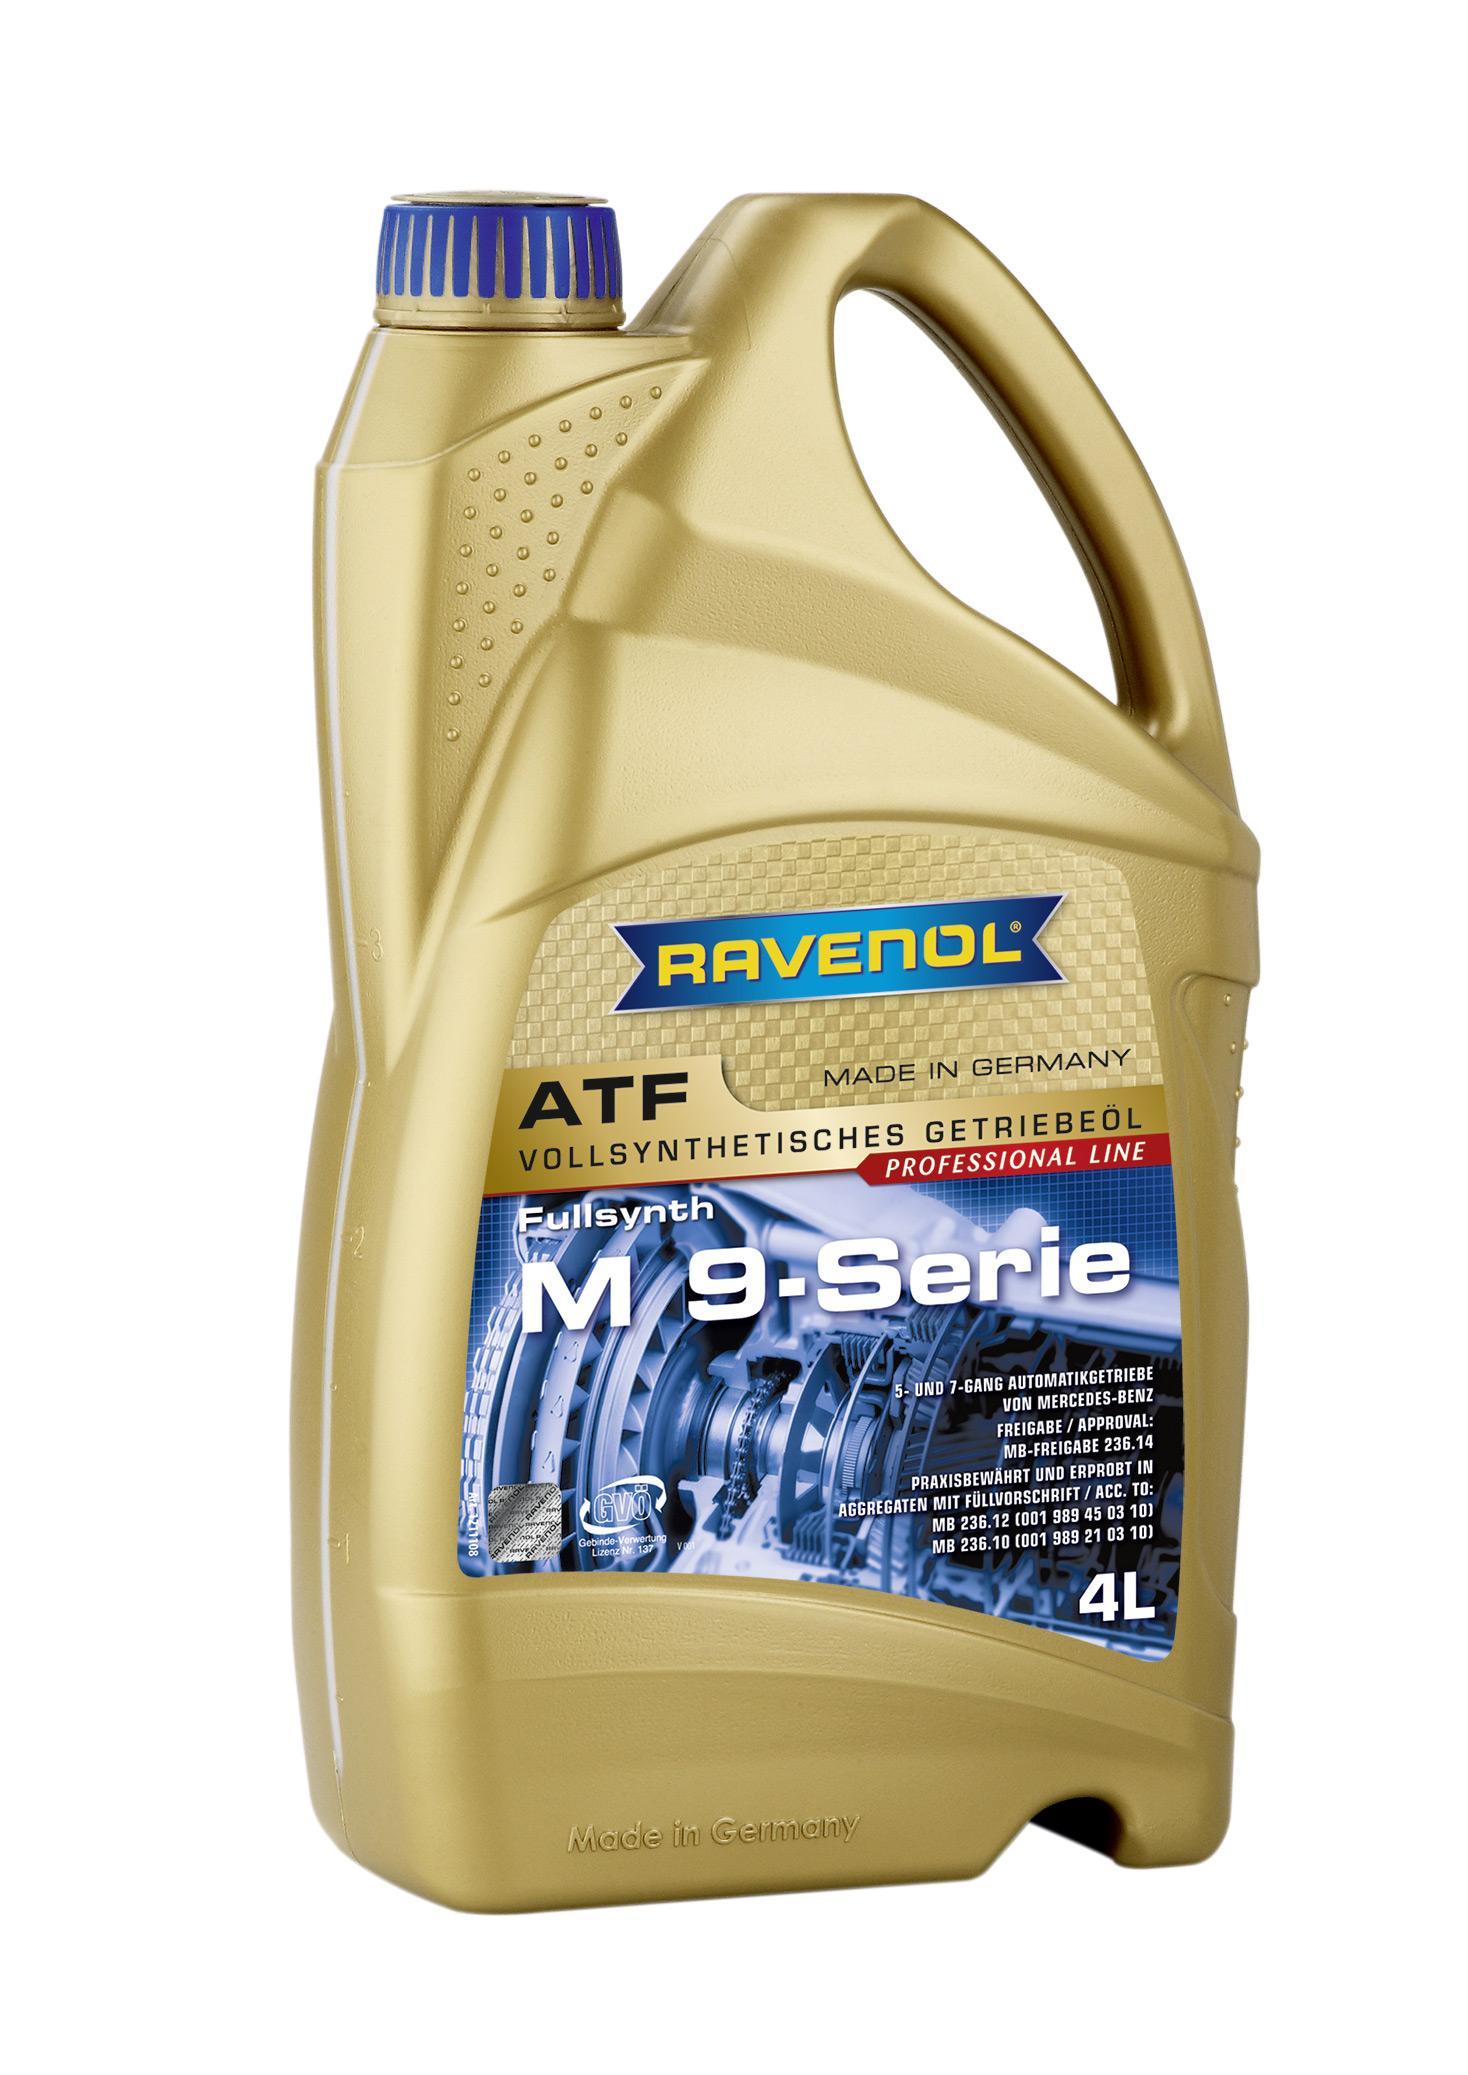 Трансмиссионное масло RAVENOL ATF M 9-Serie ( 4л) new 4014835732490